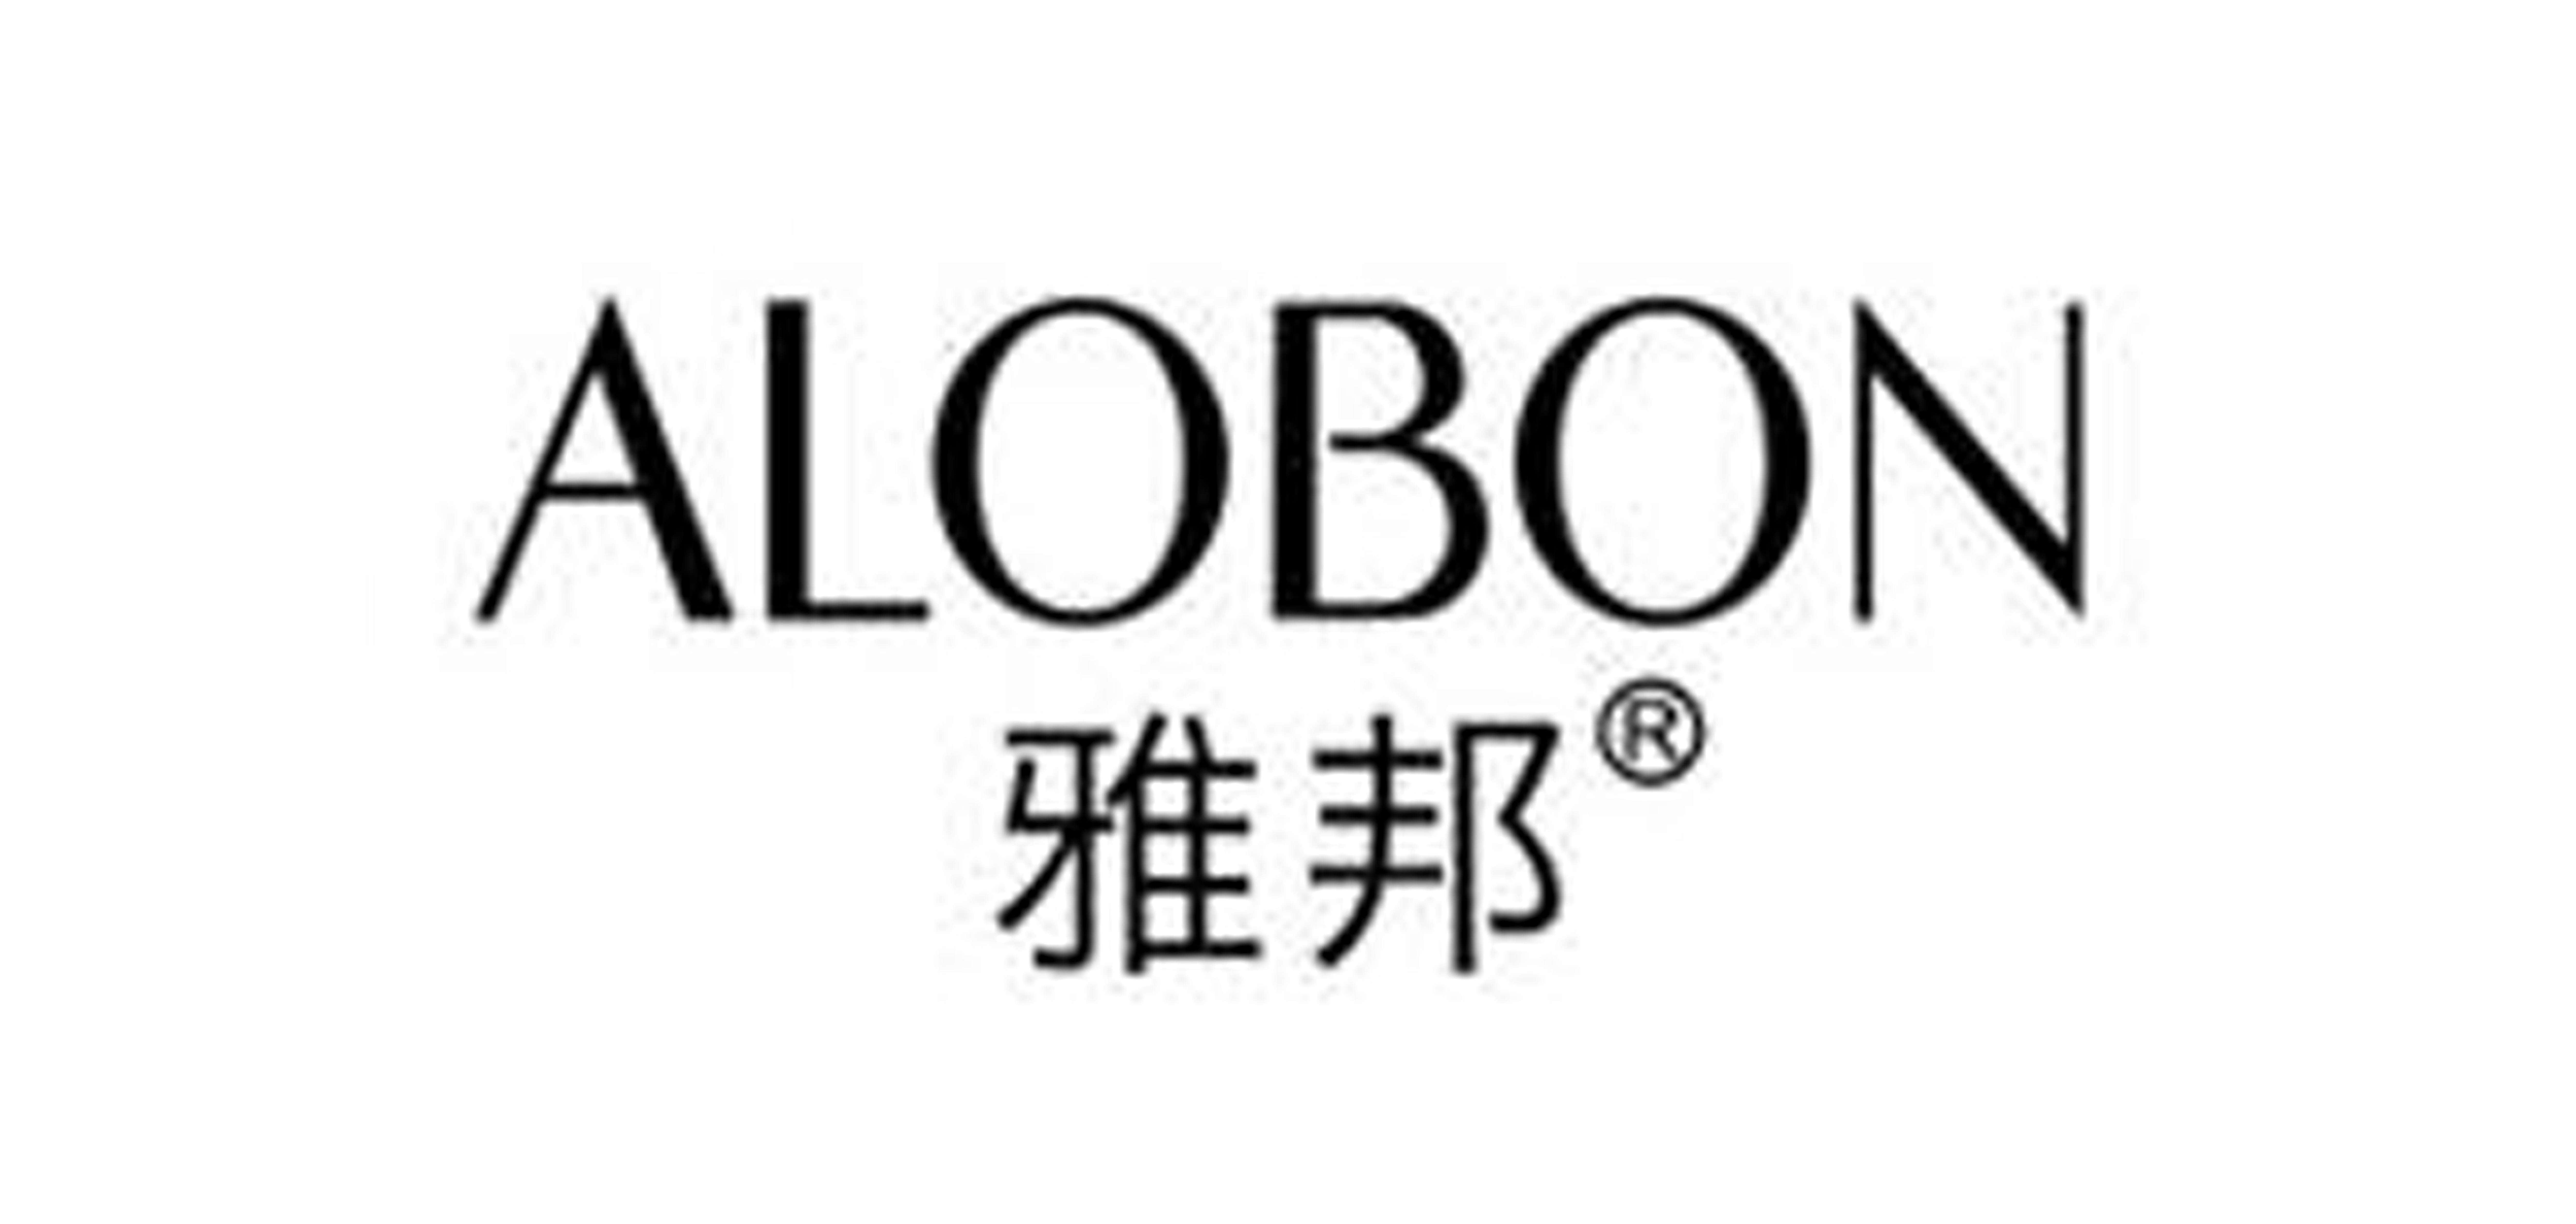 ALOBON是什么牌子_雅邦品牌怎么样?